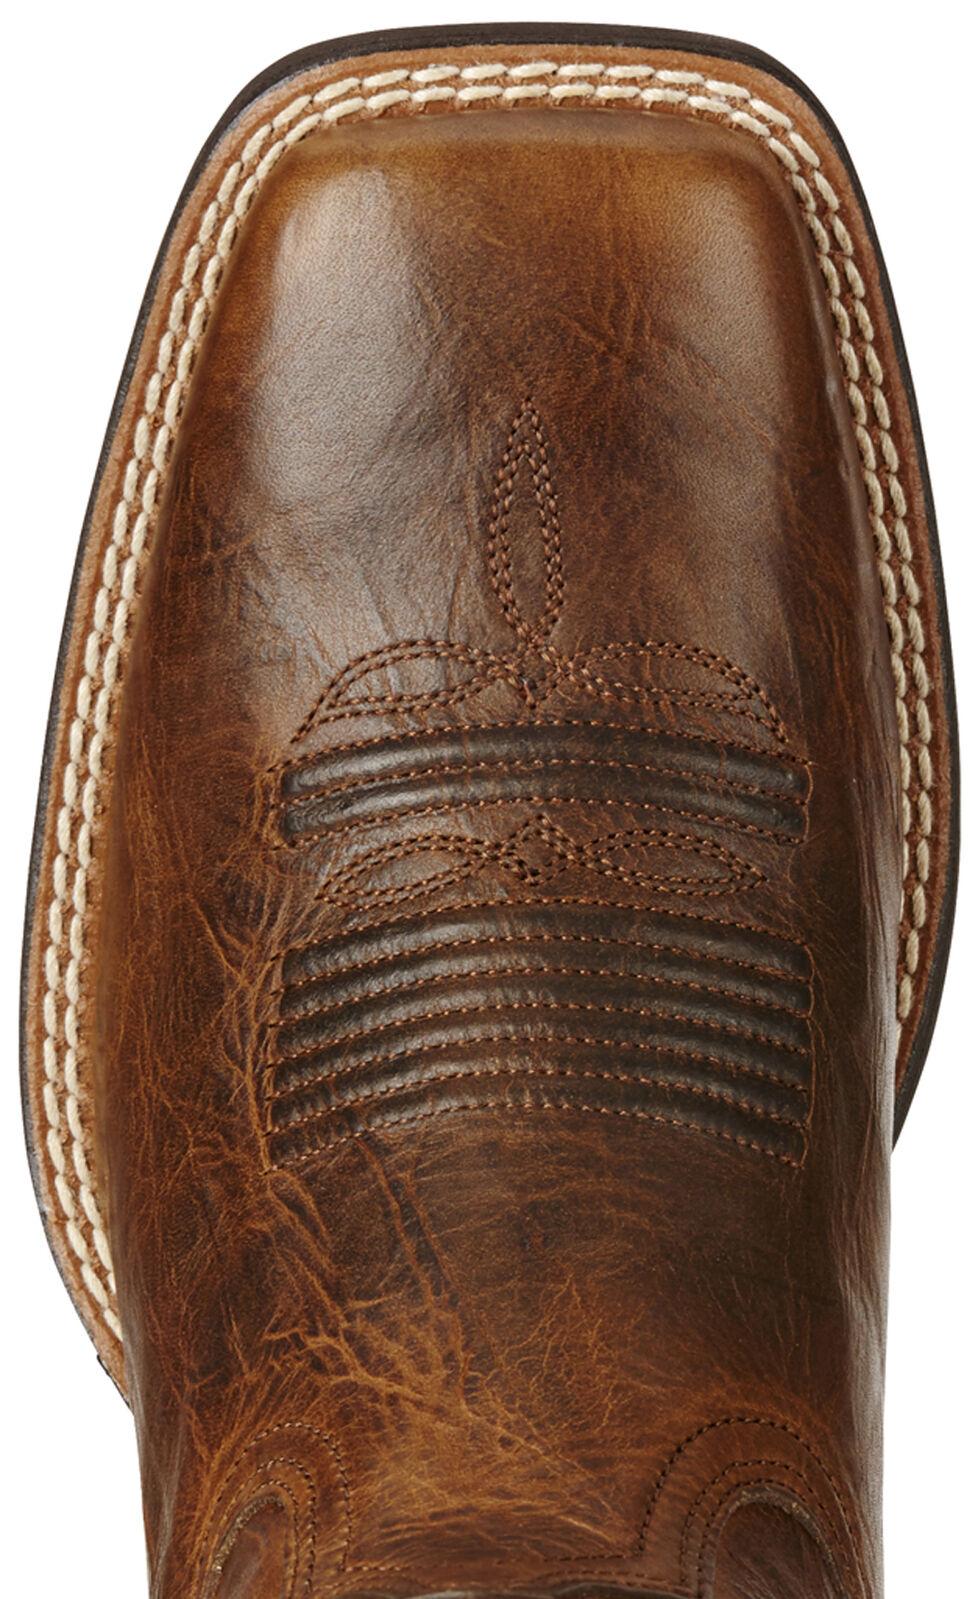 Ariat Brown Women's Quickdraw Venttek Boots - Wide Square Toe , Brown, hi-res